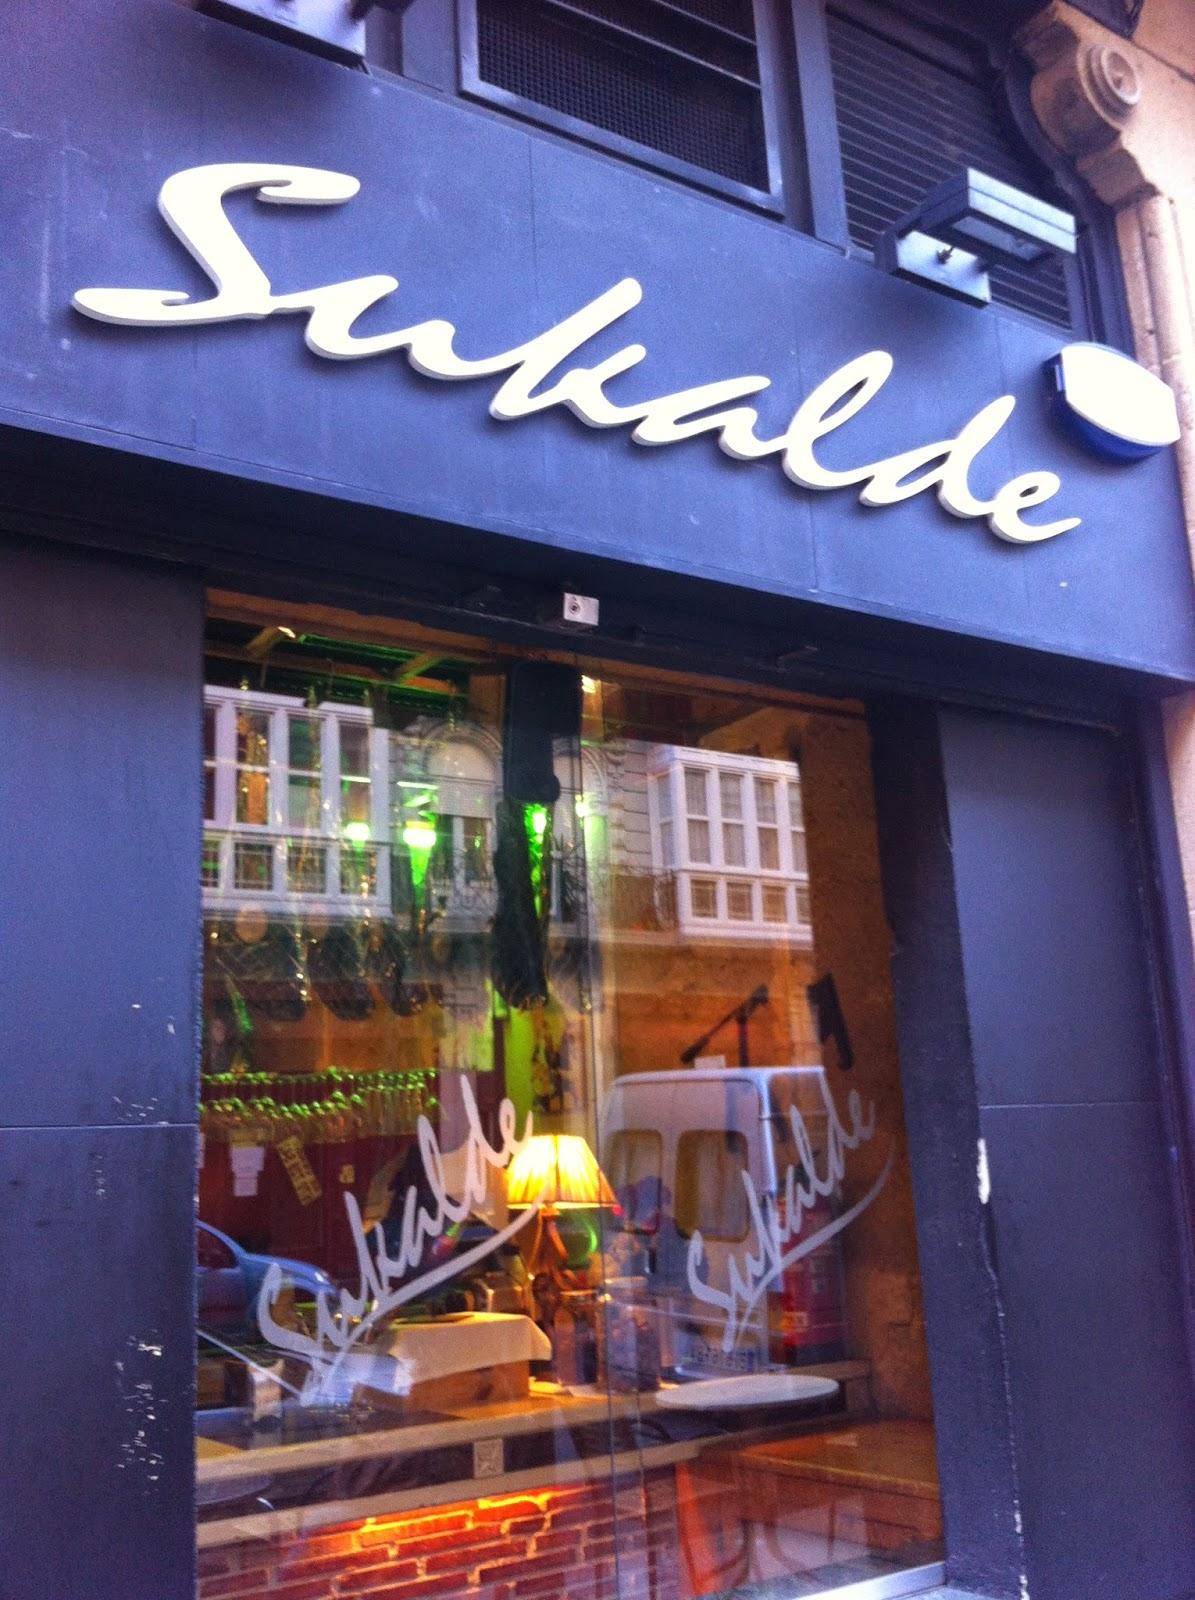 Entrada al restaurante Sukalde en Bilbao